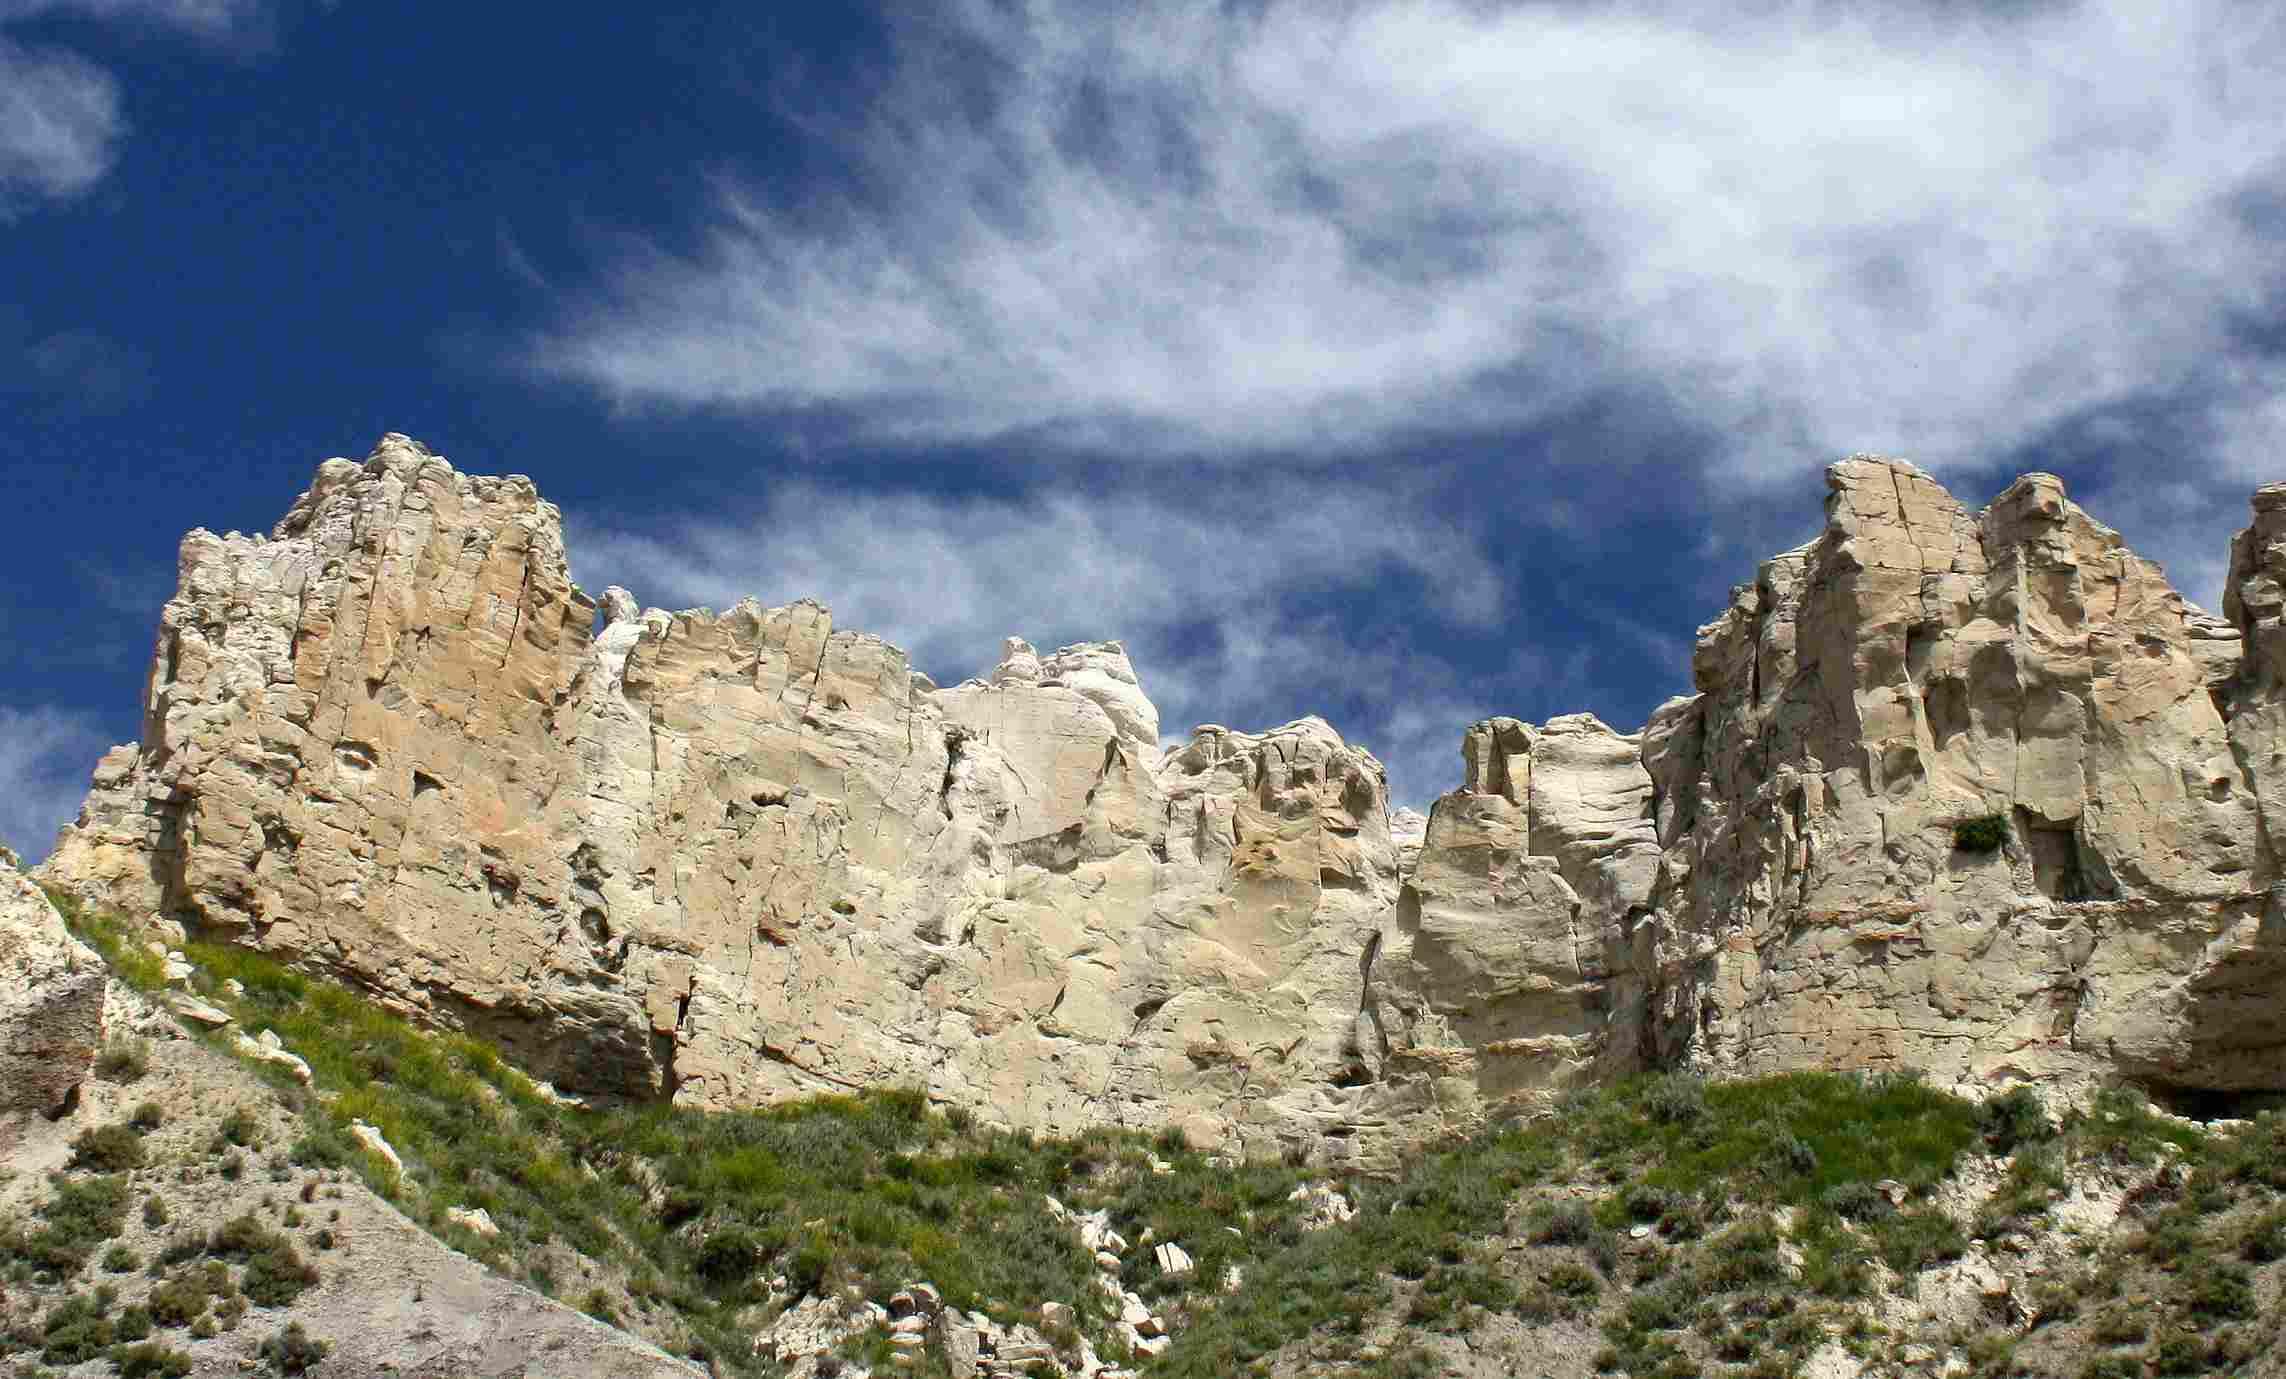 Cliffs in Upper Missouri River Breaks National Monument